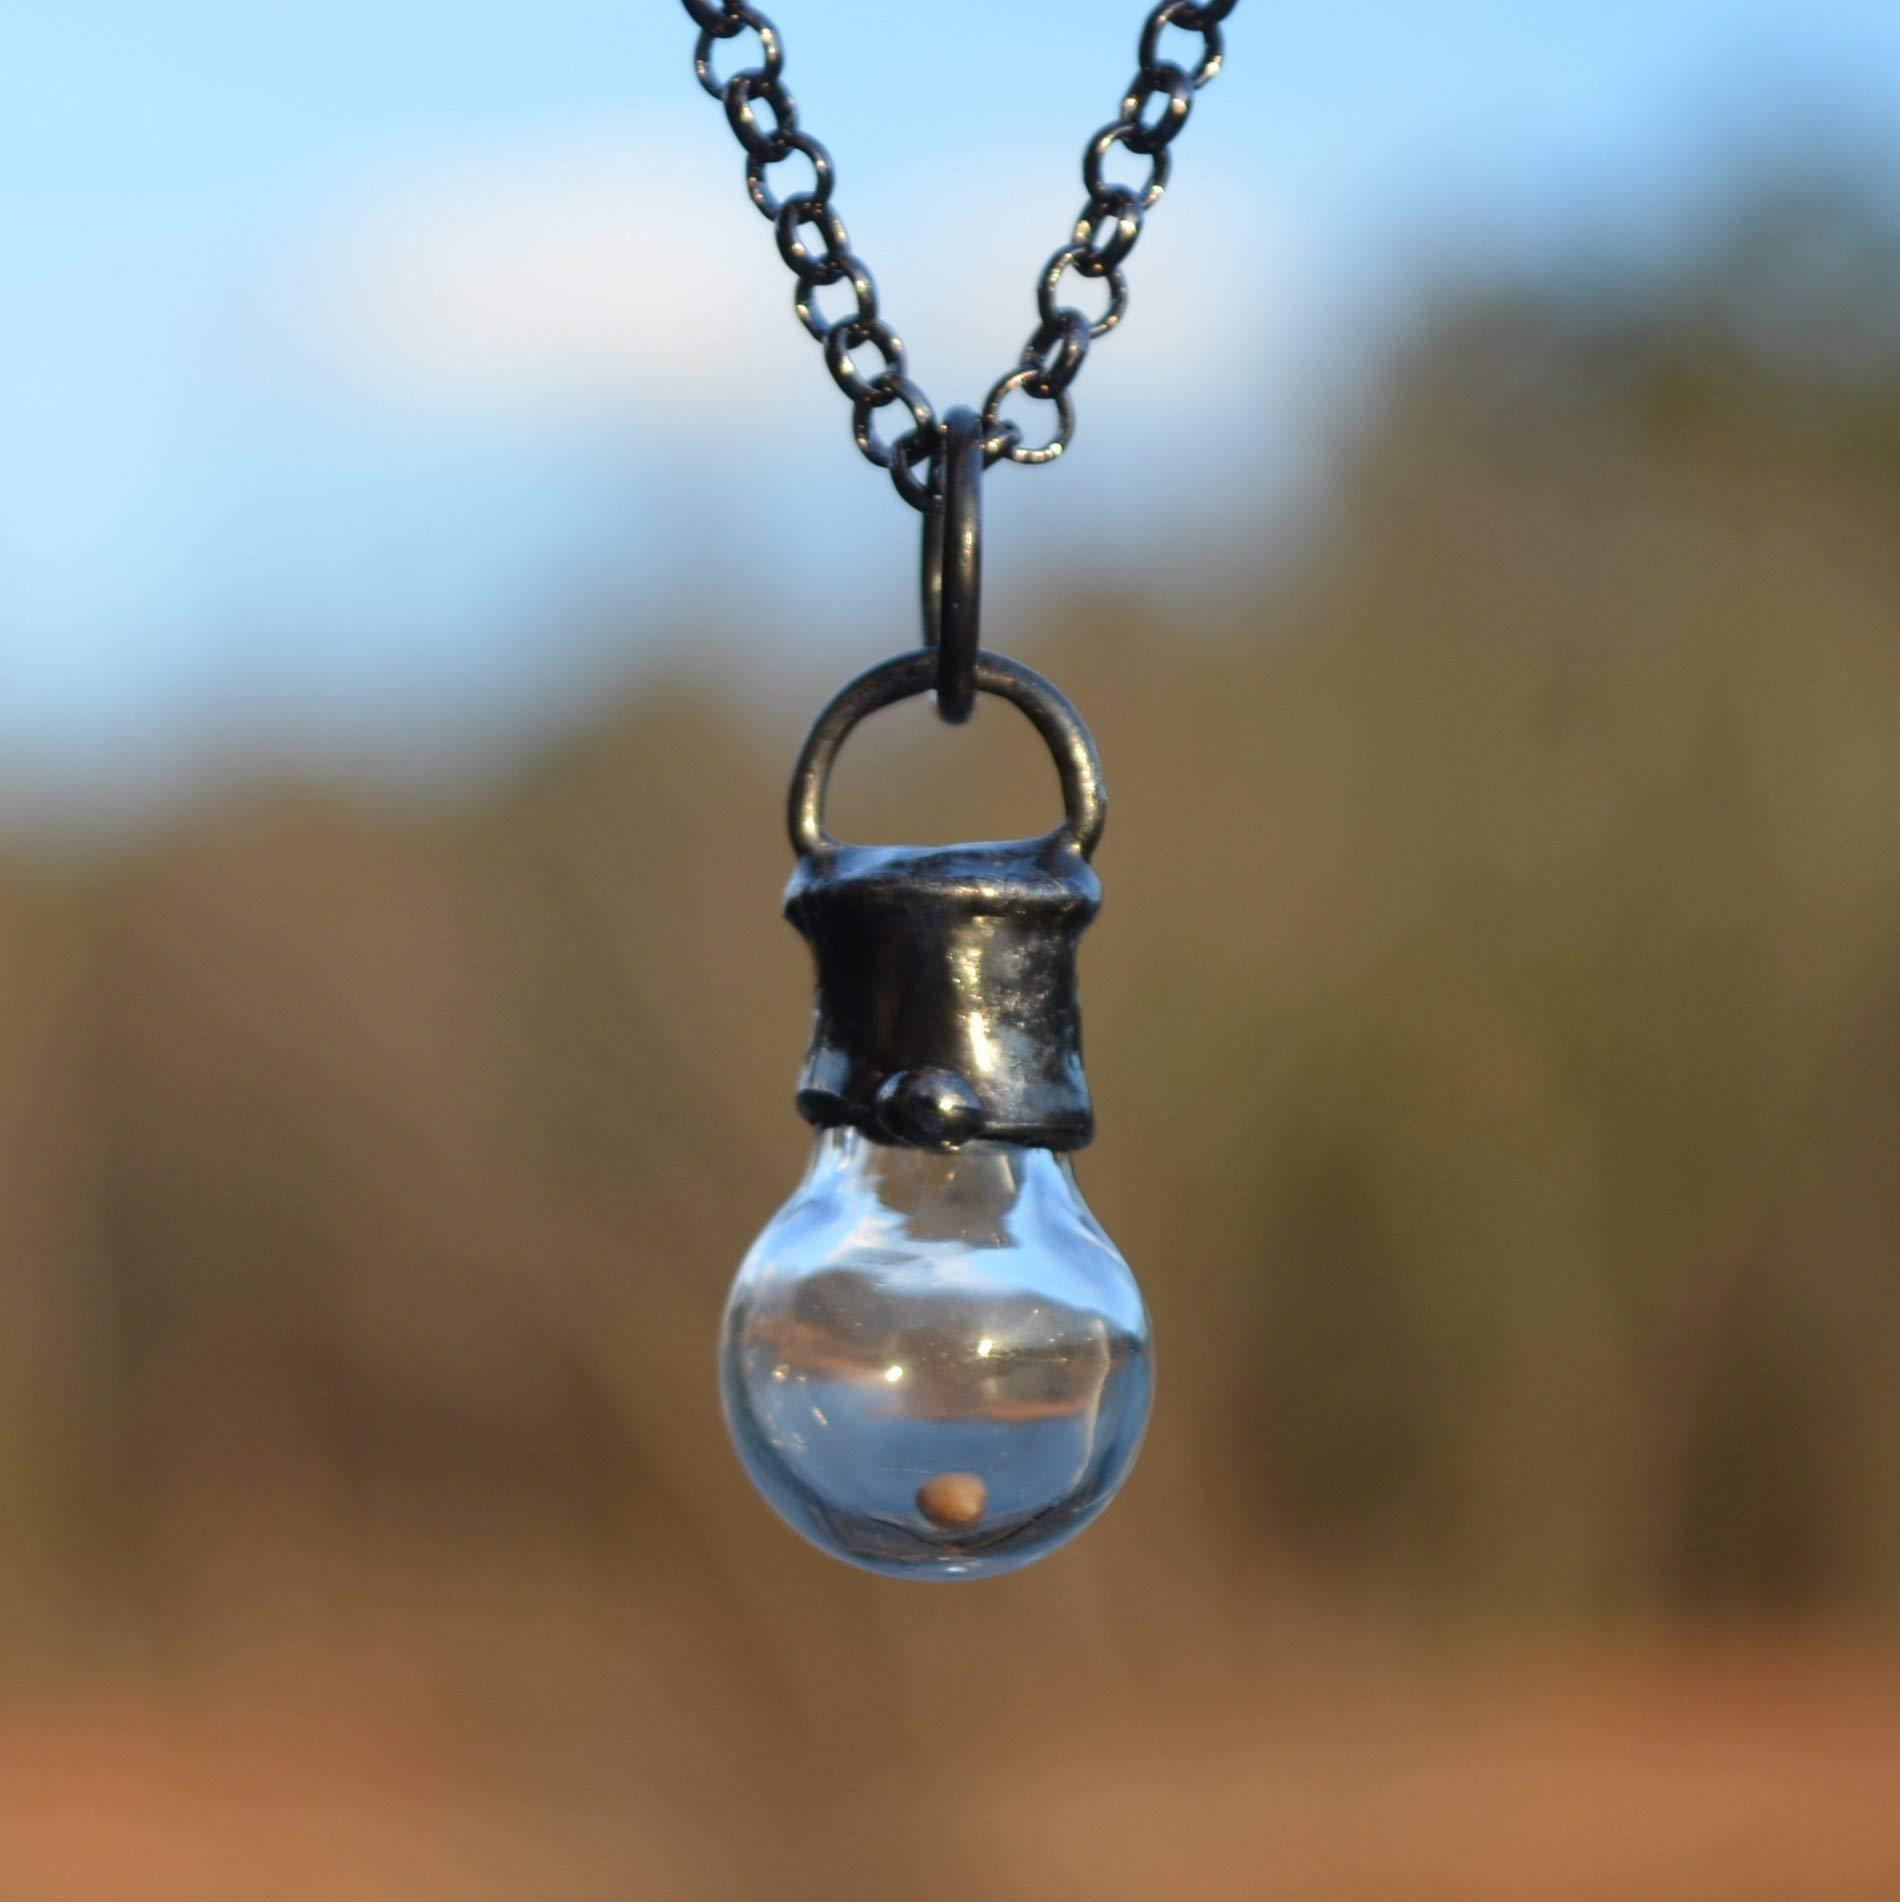 Handmade Faith of a Mustard Seed, Hand Blown Glass Bottle Pendant, Christian Communion Gift Necklace 2705